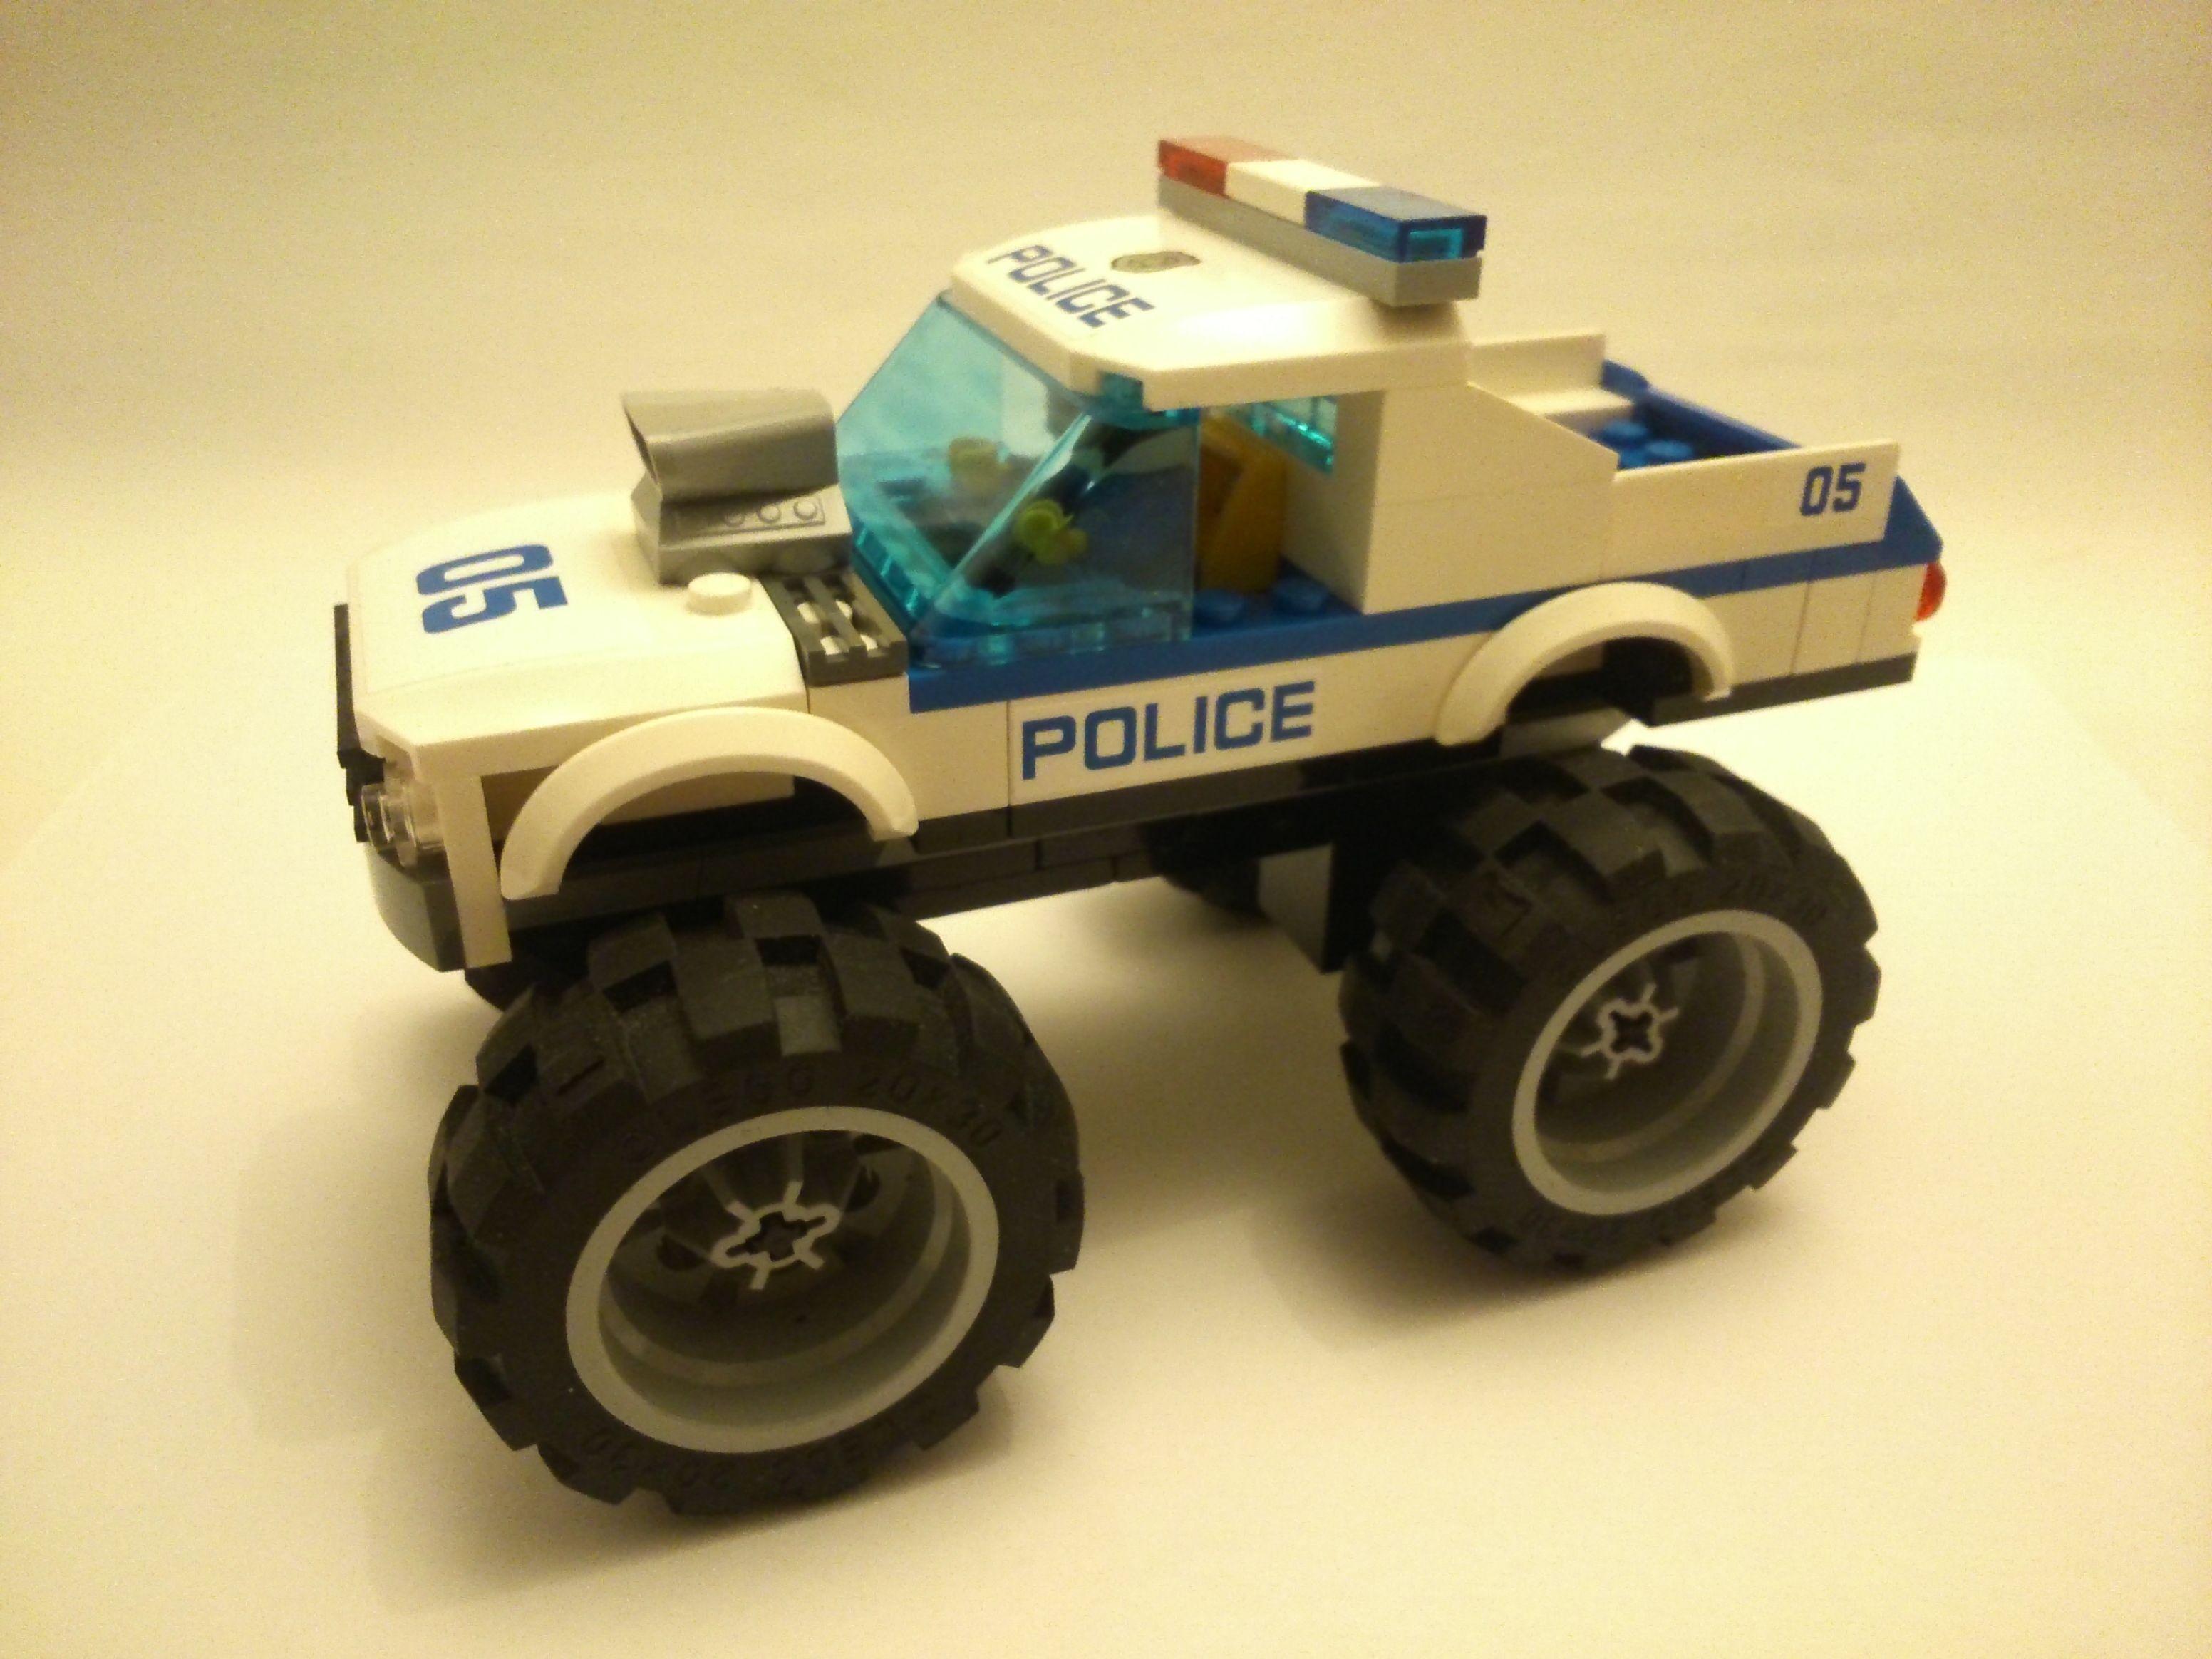 1//32 skala Batman Diecast Car Modell Beetle Klassische Fahrzeuge Auto Spielzeug